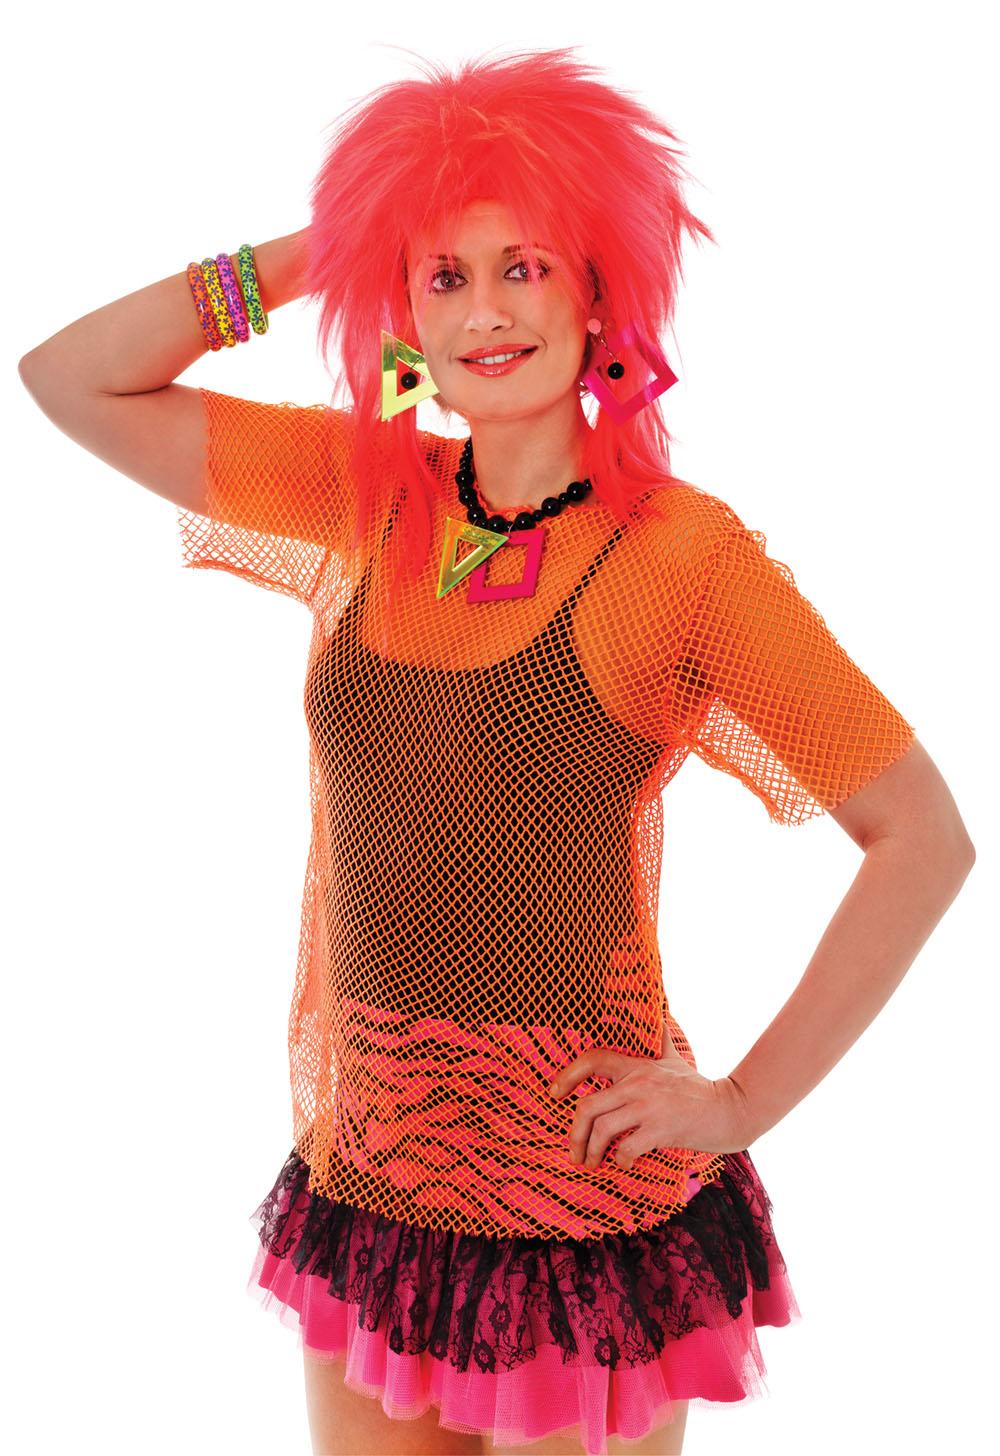 Womens Orange Mesh Top Fancy Dress Costume Punk Rocker 1980S Emo Rave Outfit